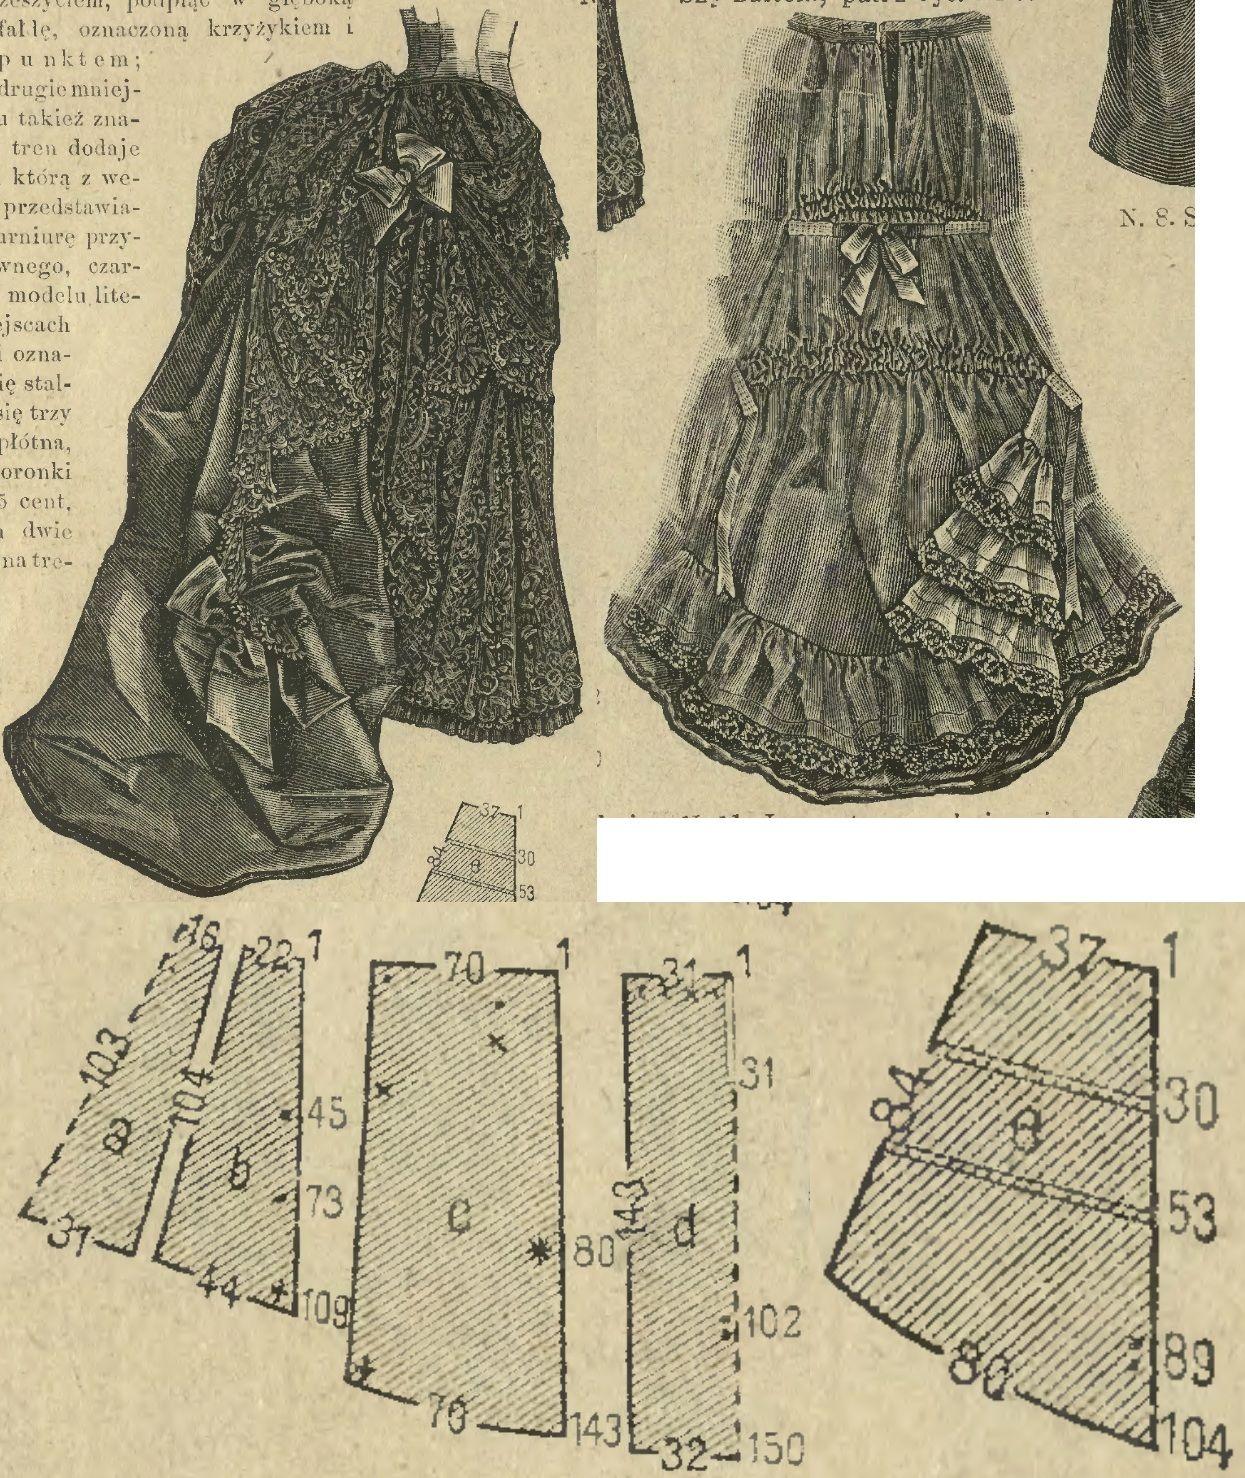 Tygodnik Mód 1887.: Demi-train foundation skirt for evening gowns ...